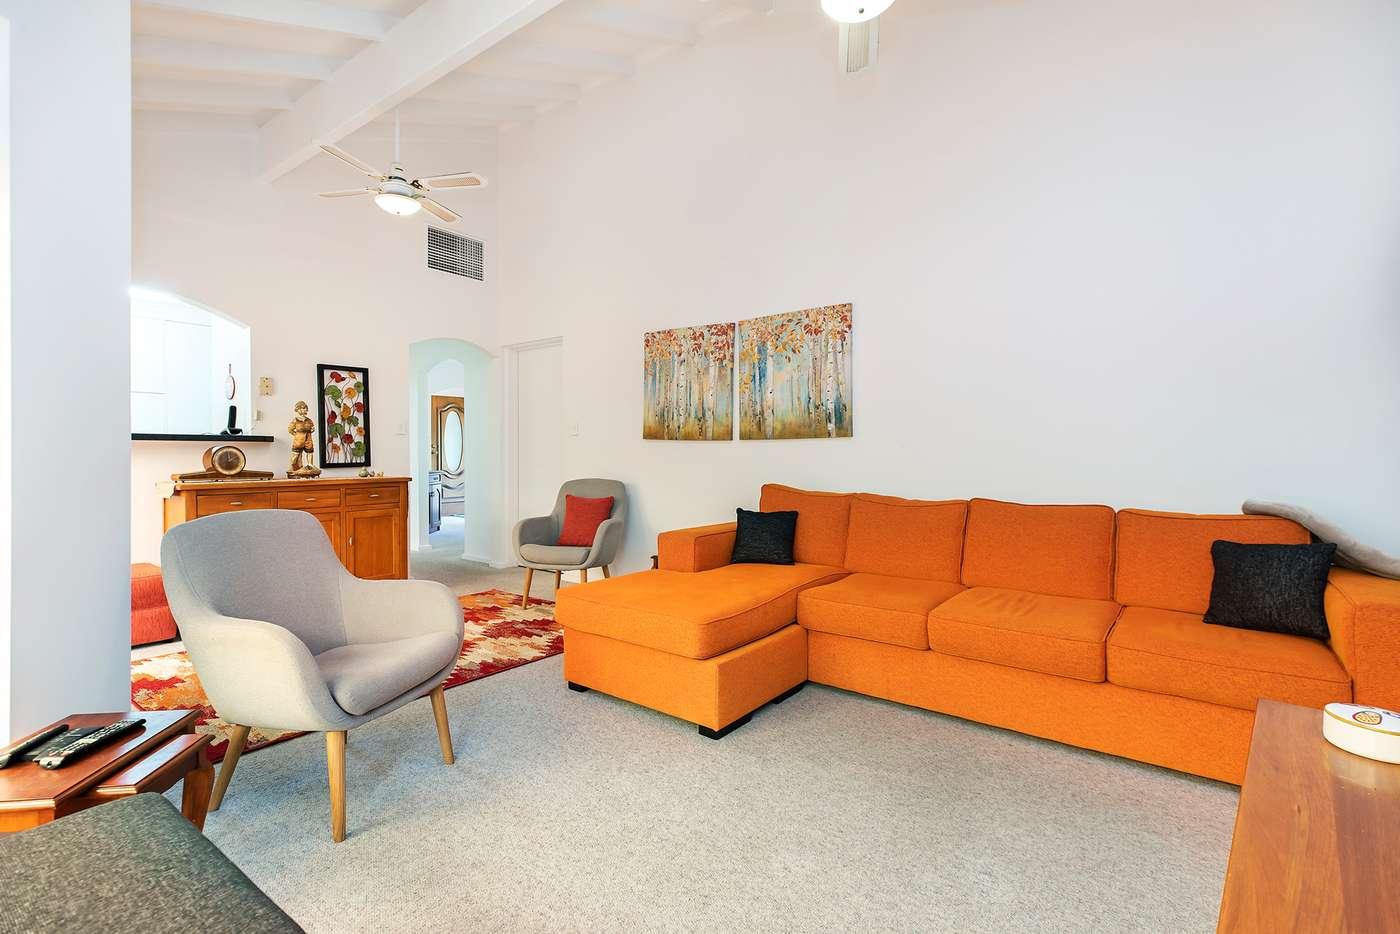 Sixth view of Homely house listing, 22 Wandilla Street, Seaview Downs SA 5049